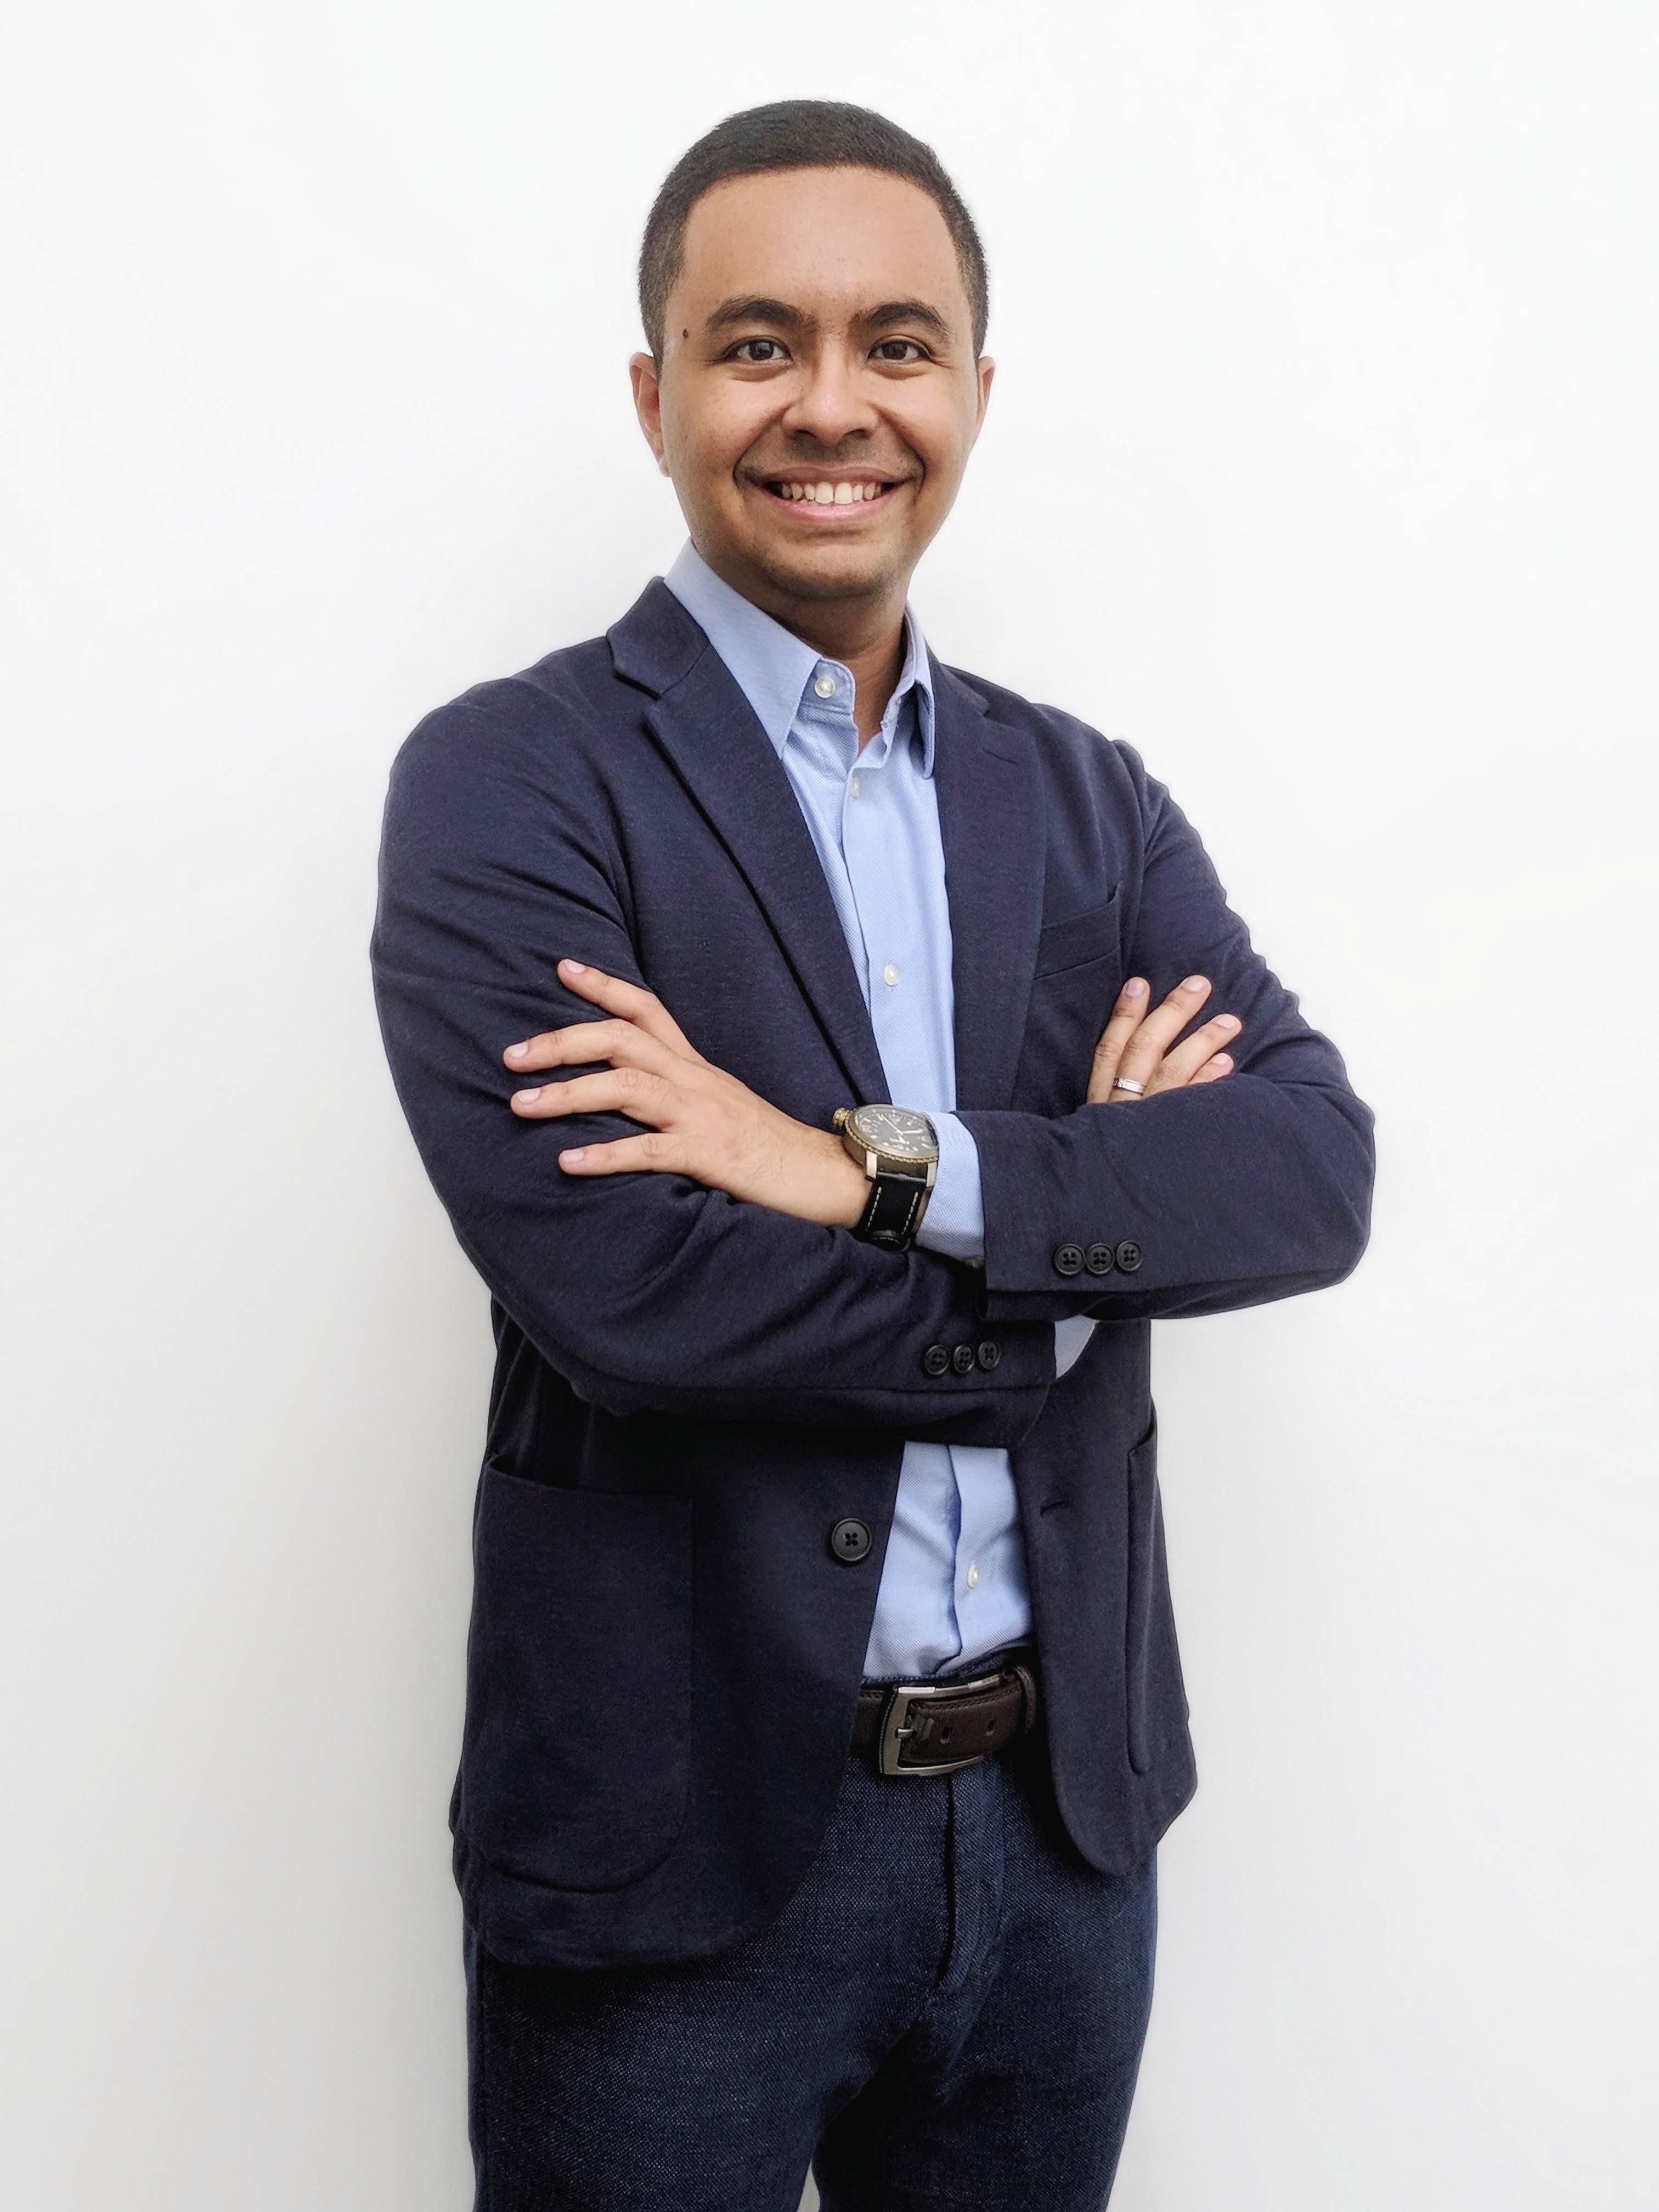 Sharif Lukman Mahfoedz